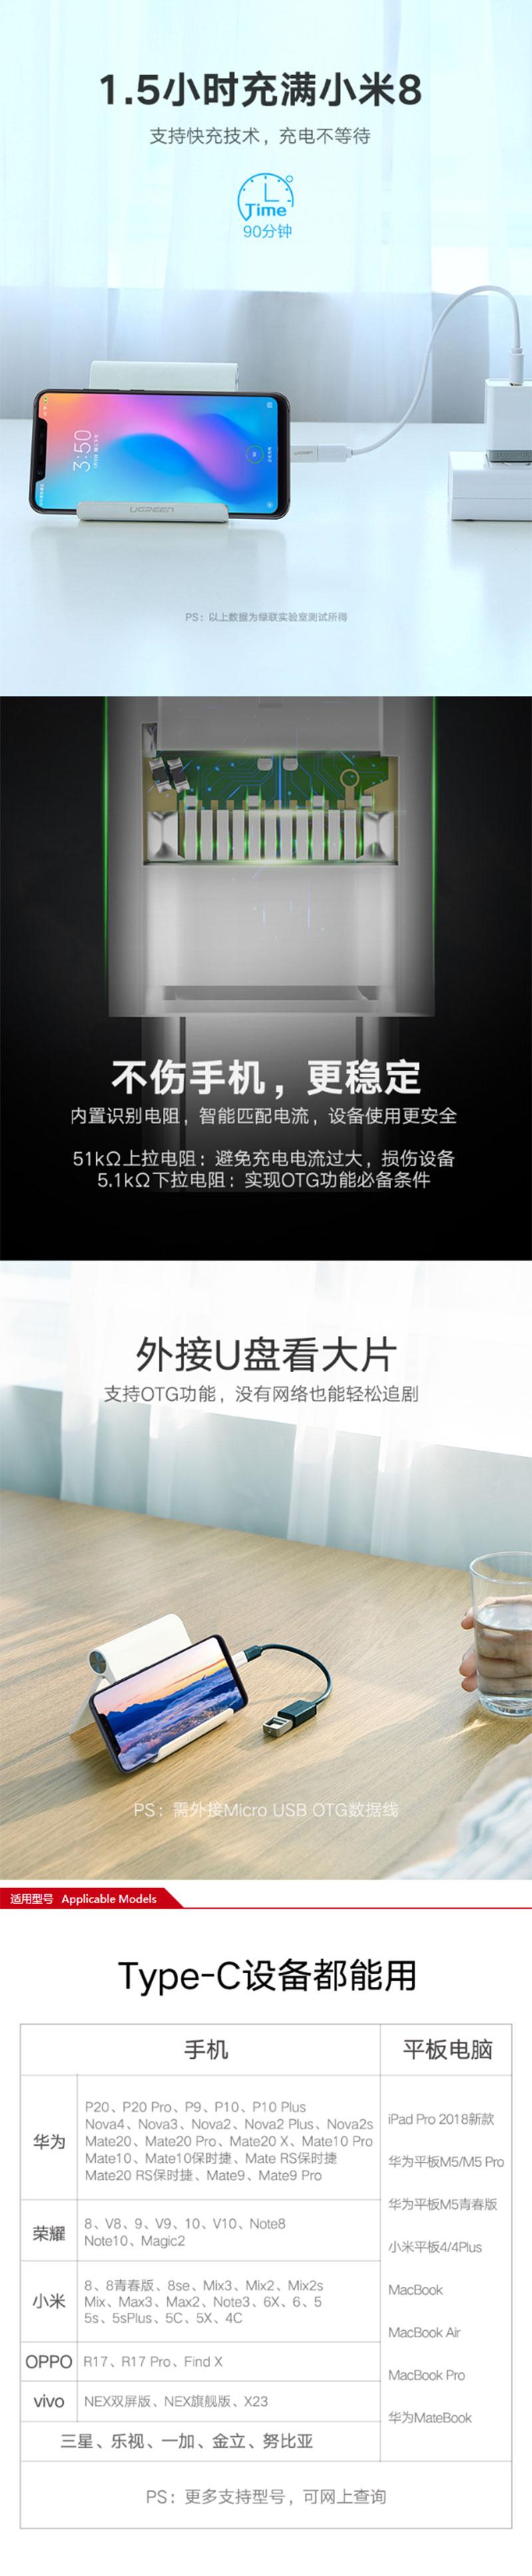 绿联30154 TYPE-C转安卓 OTG头